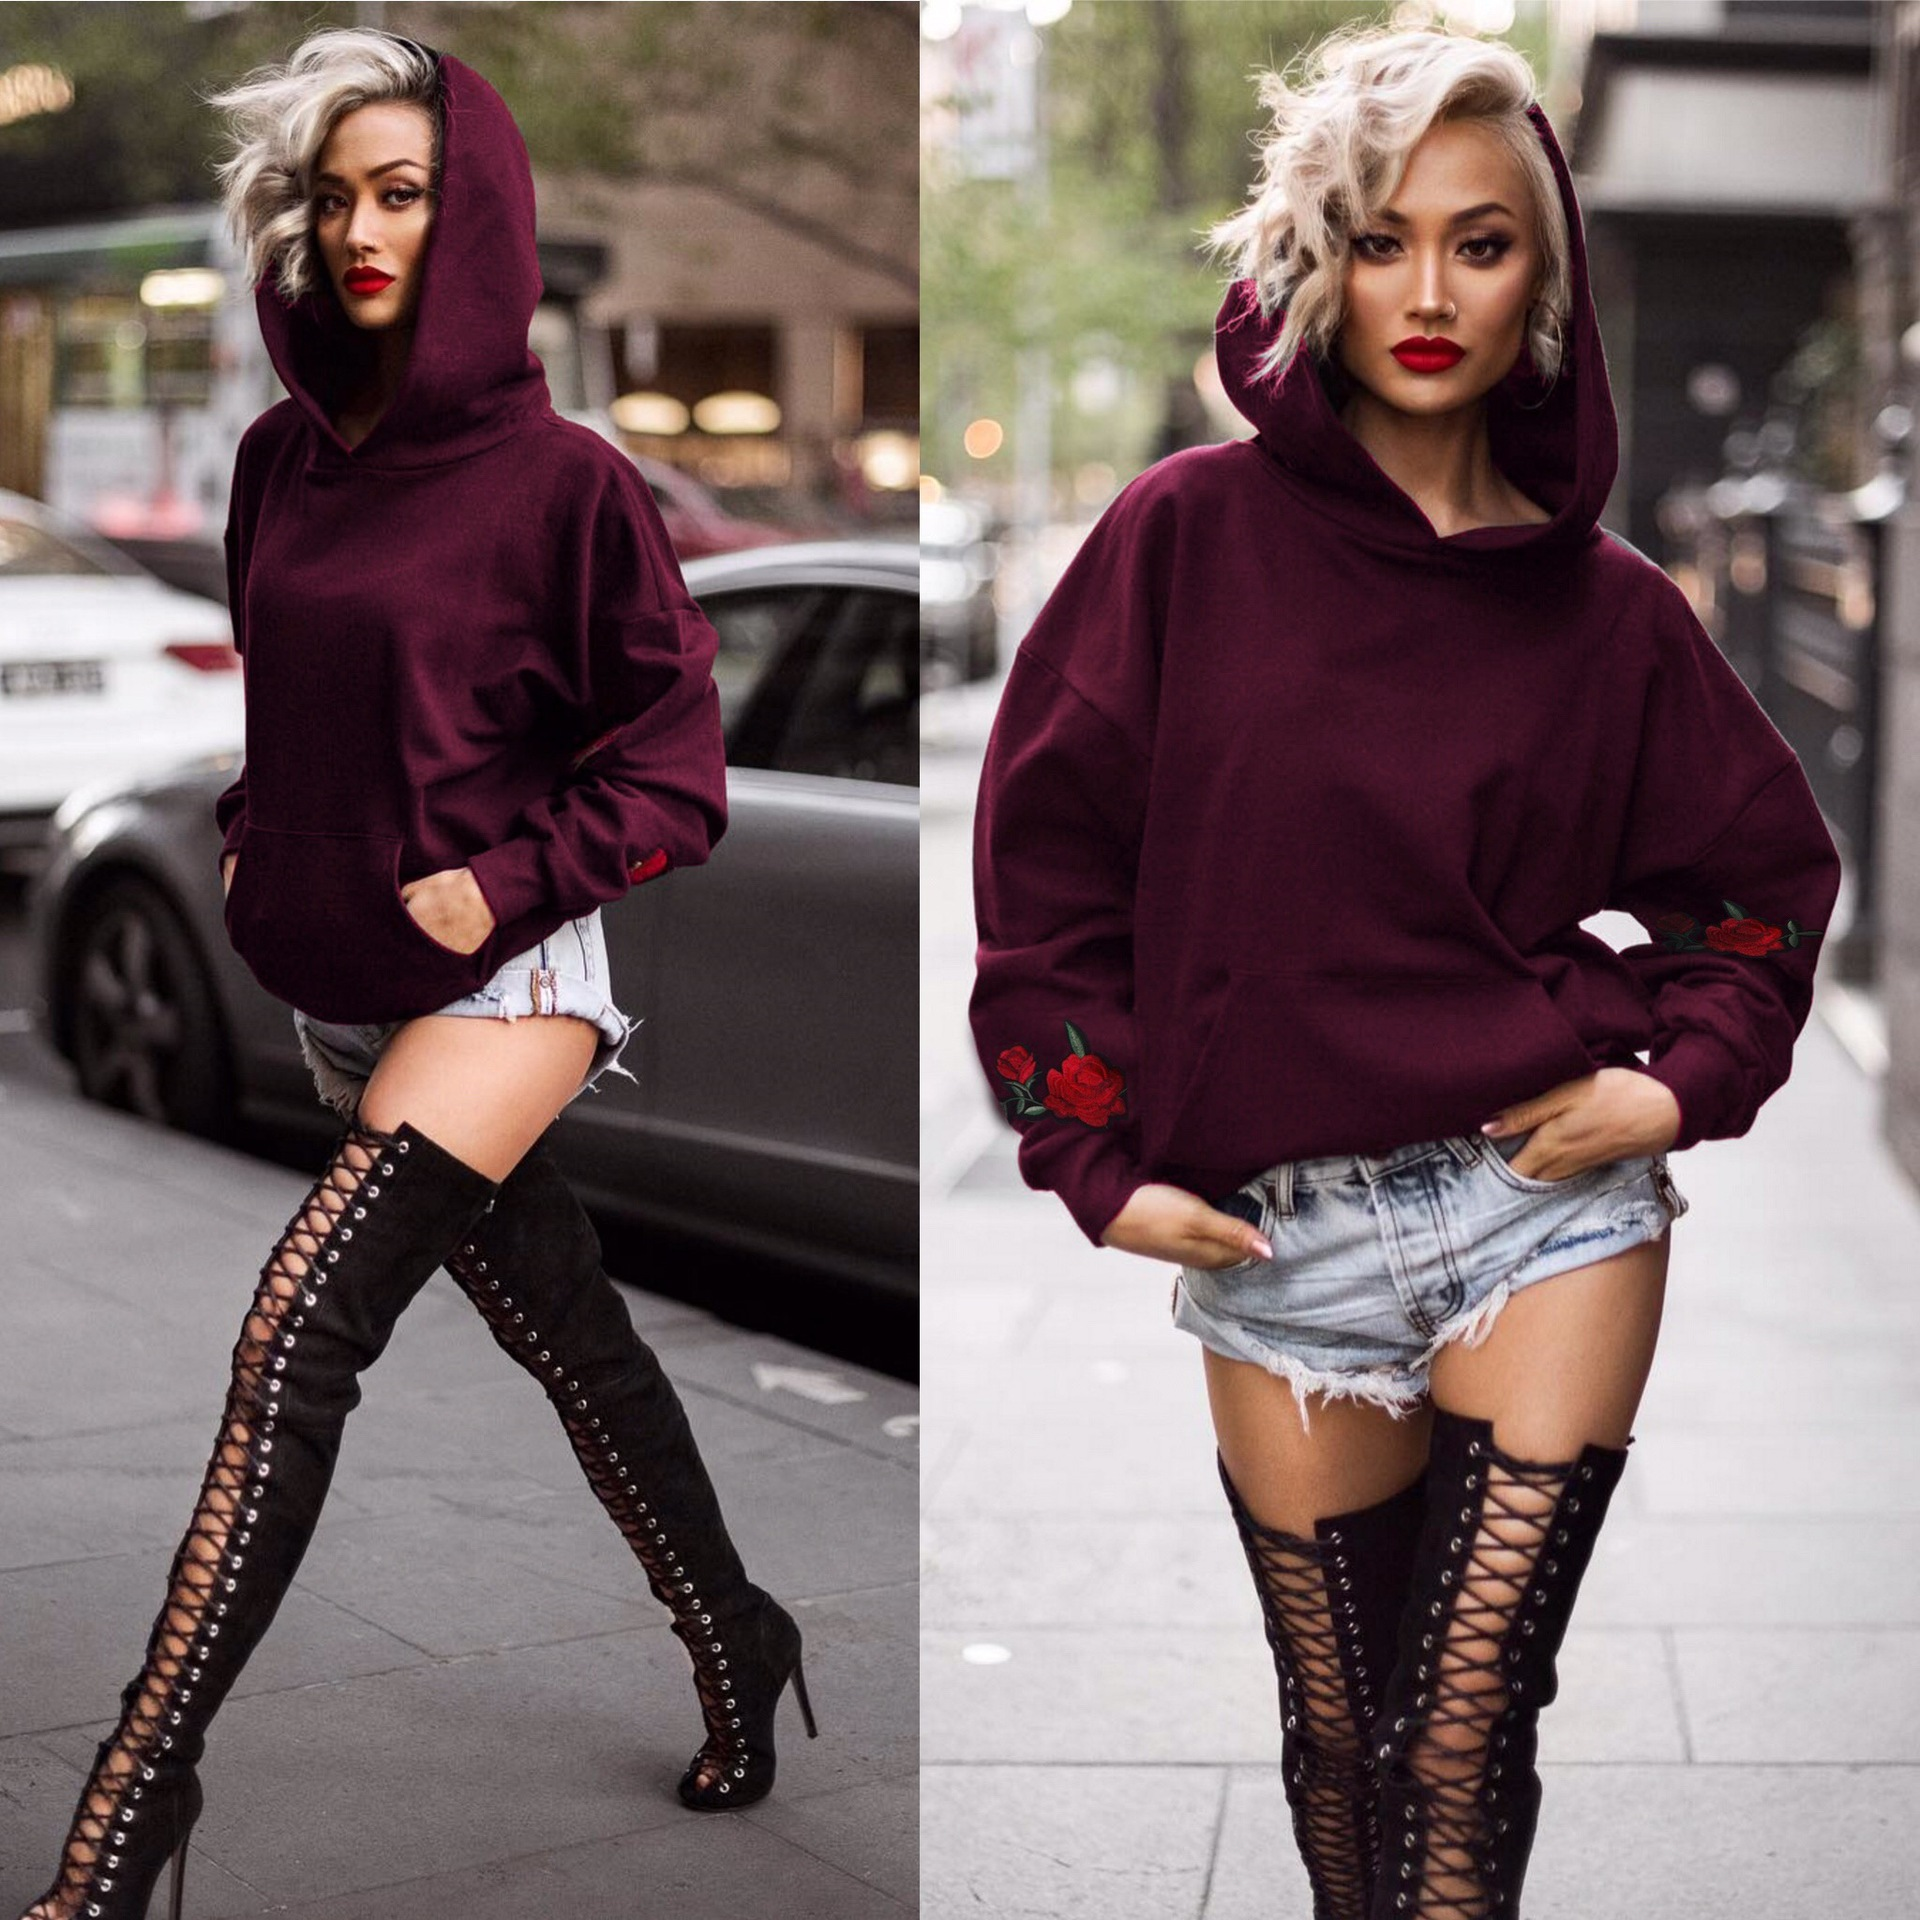 women sweatshirt fashion floral embroidery pullover streetwear gothic tops full sleeve hoodies female plus size sweatshirts in Hoodies amp Sweatshirts from Women 39 s Clothing